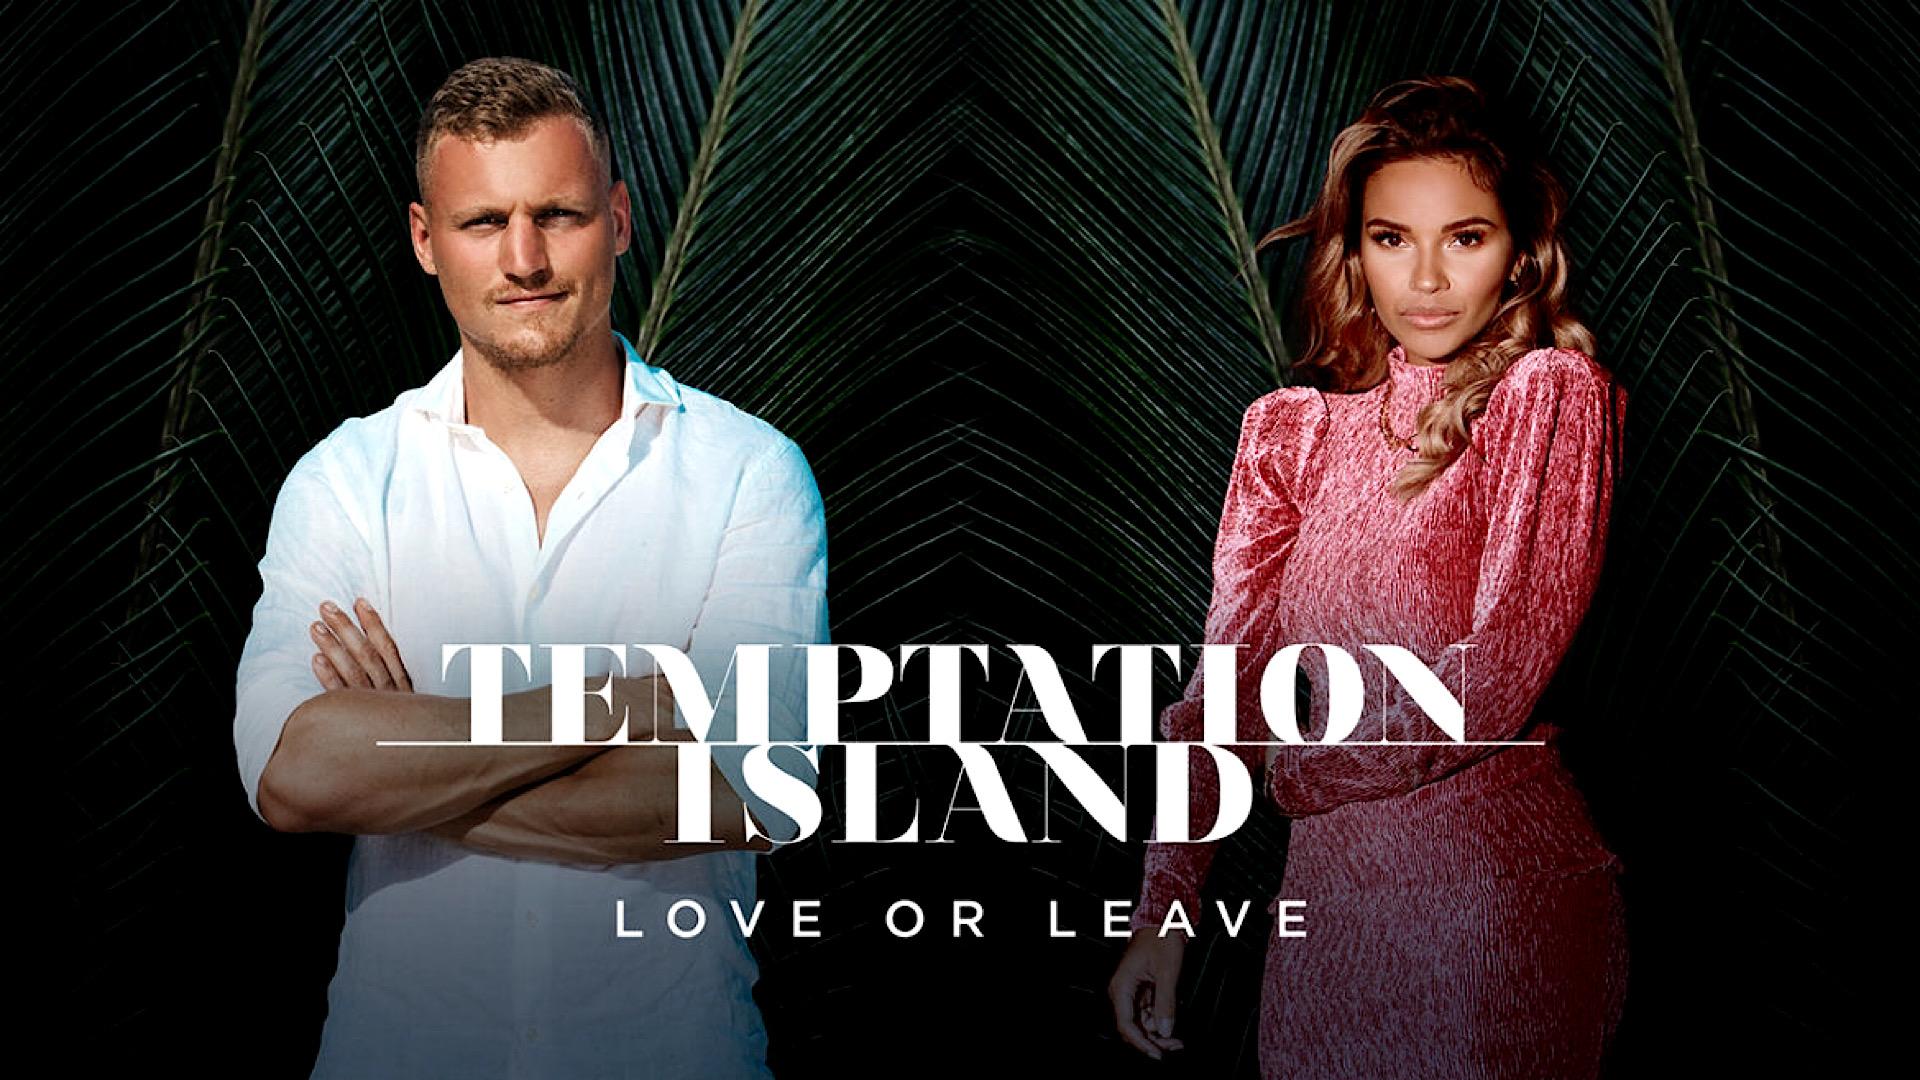 Temptation Island: Love or Leave